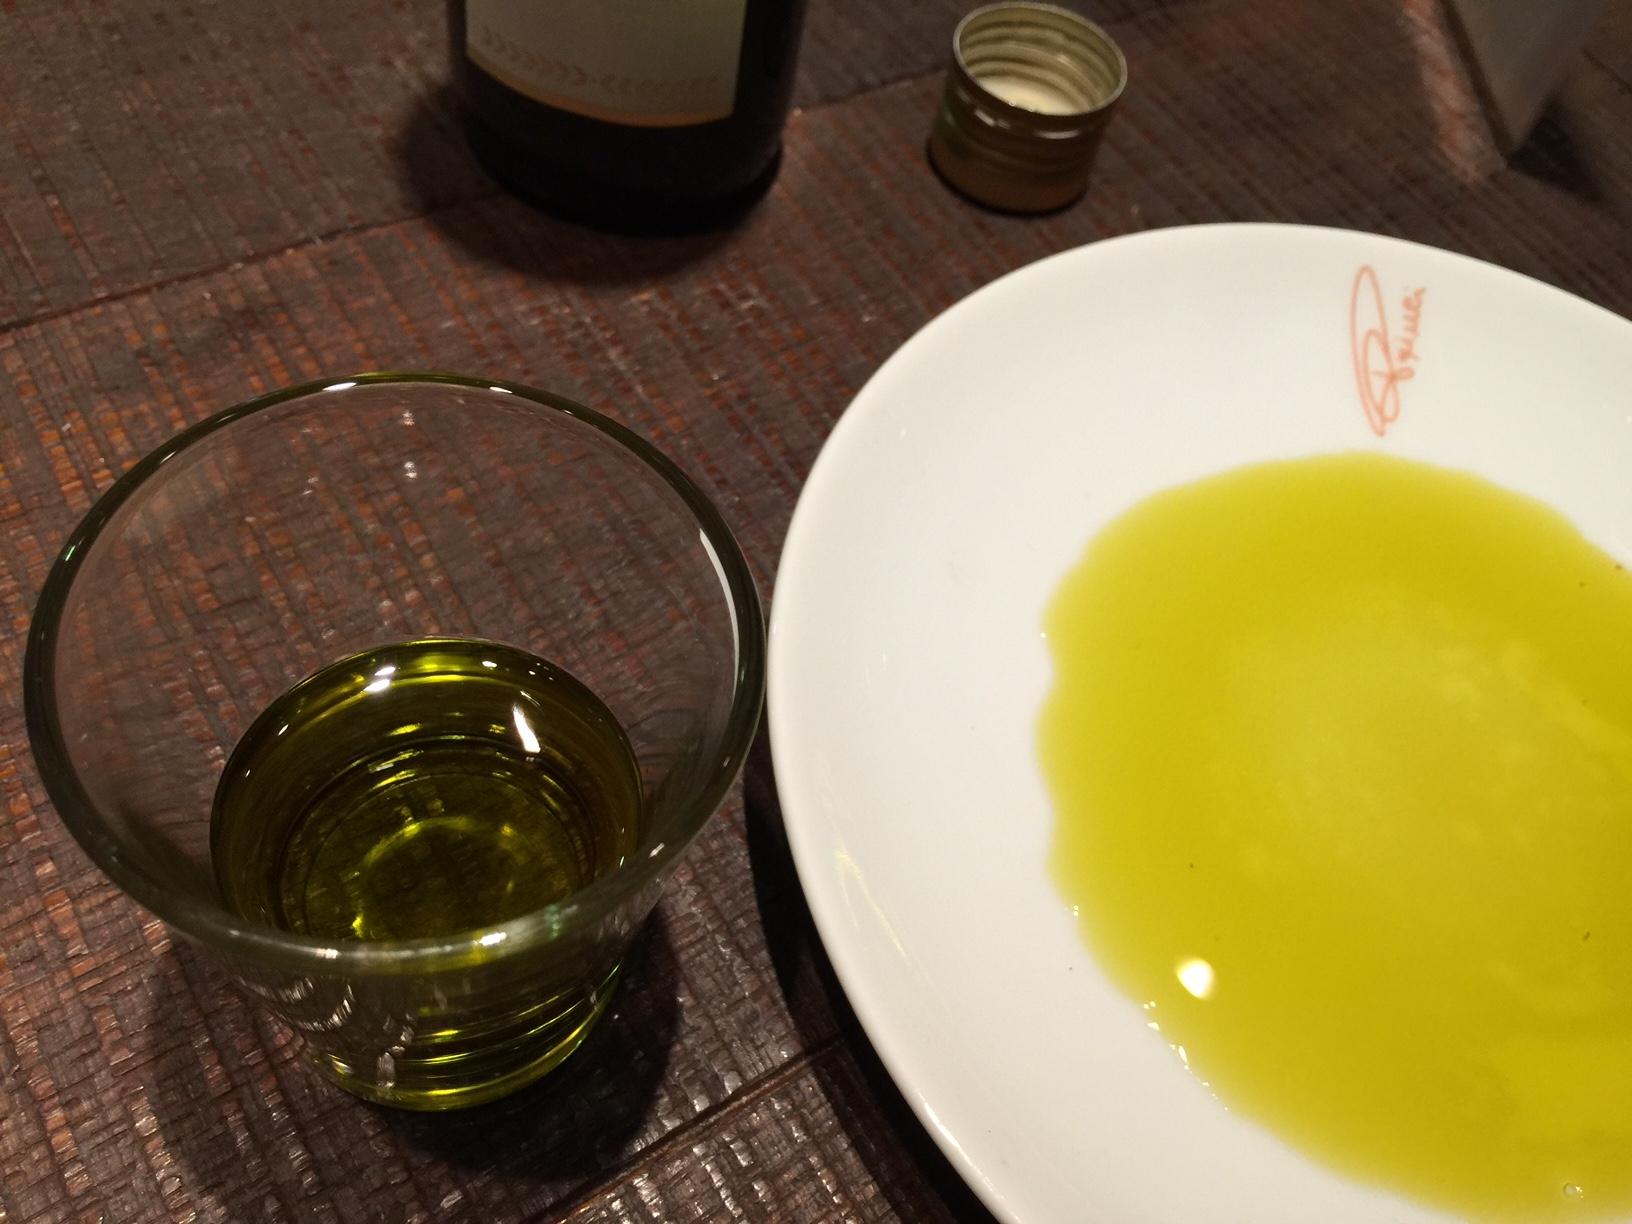 Un focus sull'olio da olive